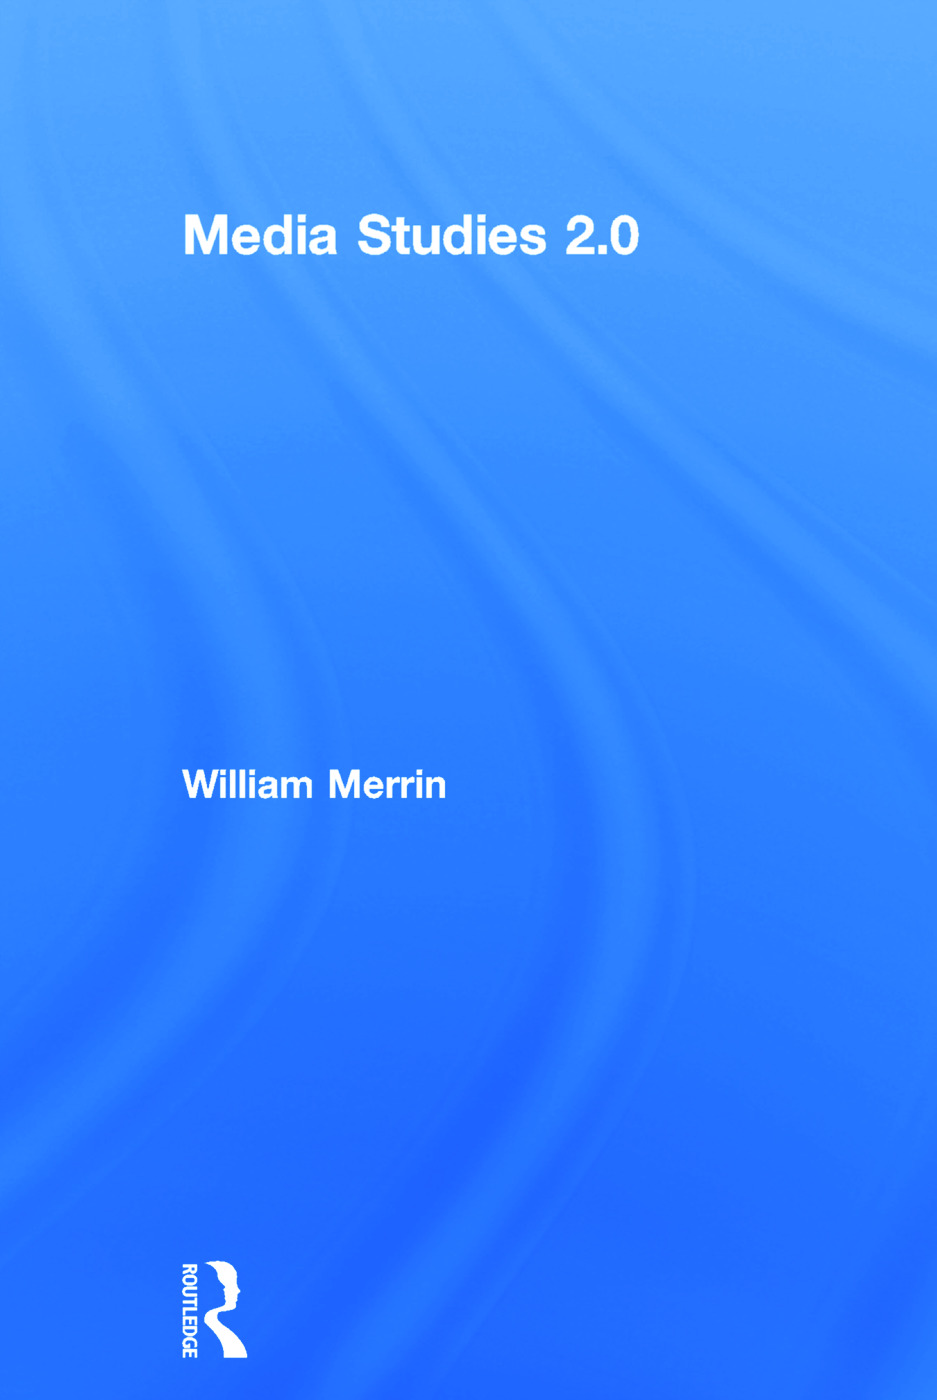 Media Studies 2.0